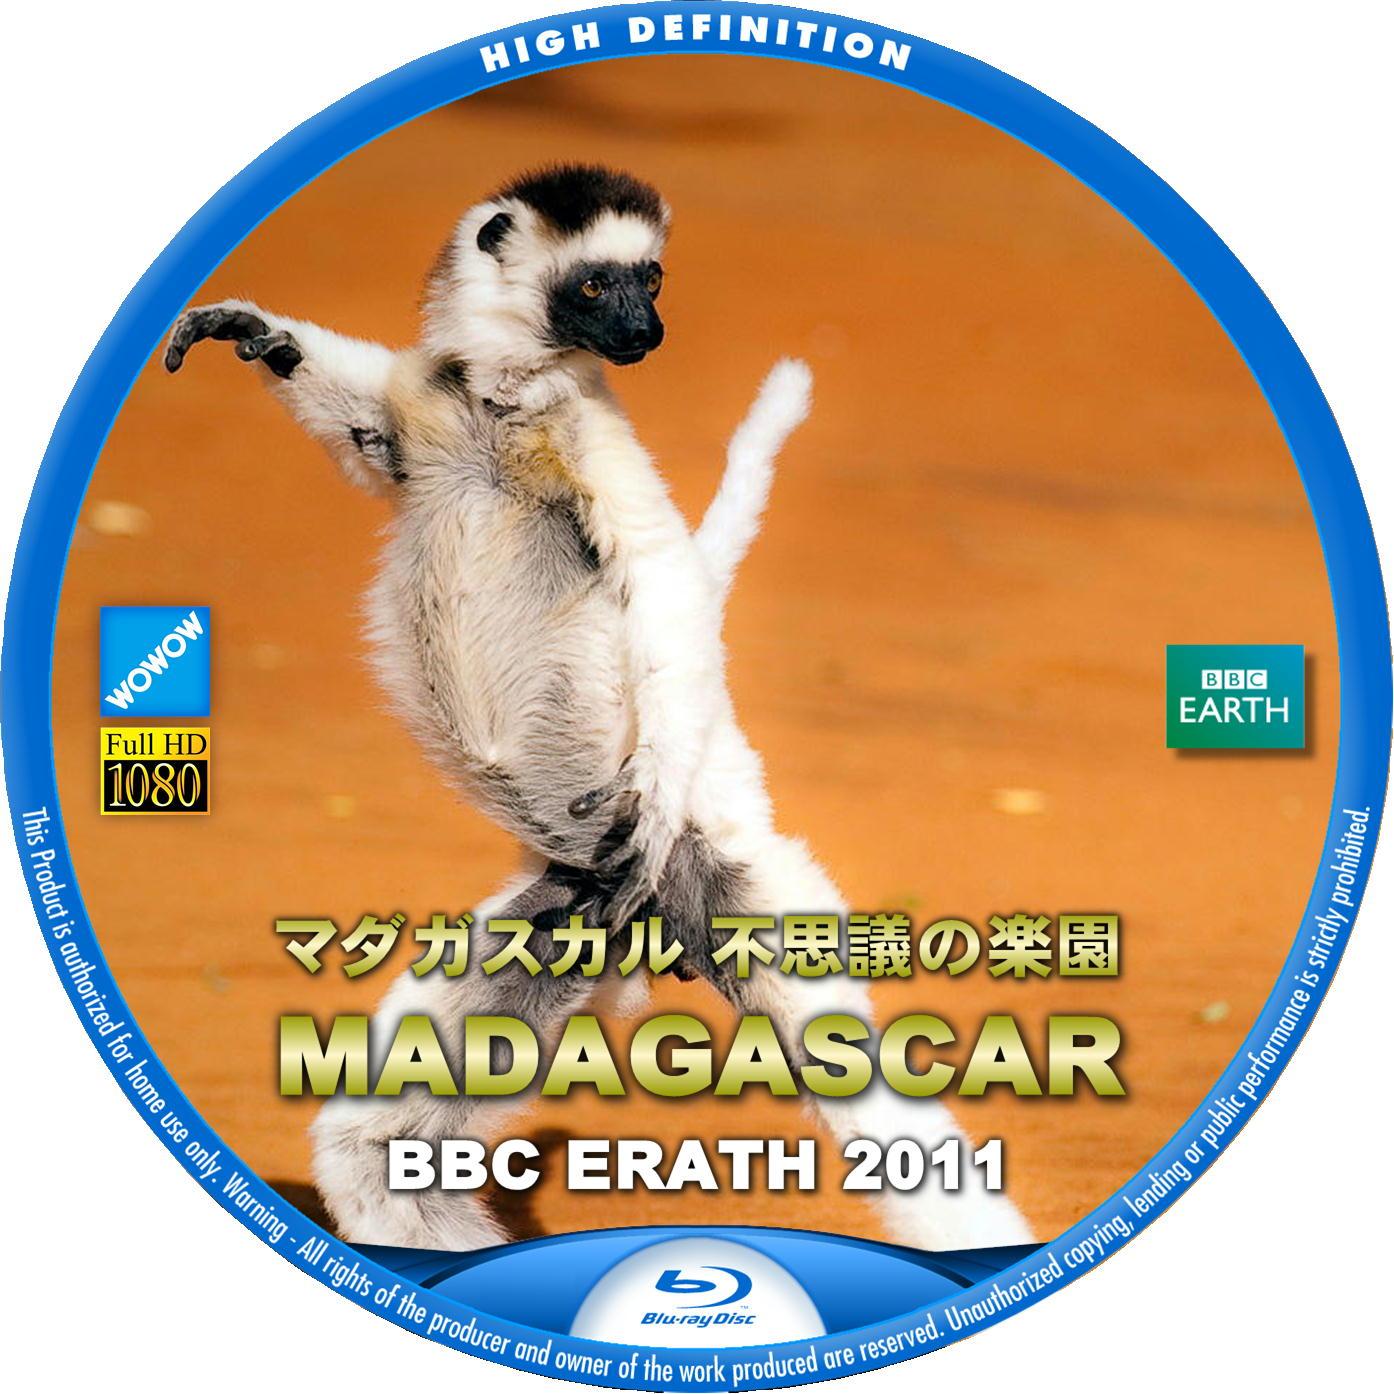 BBC EARTH 2011 マダカスカル 不思議の楽園 BDラベル